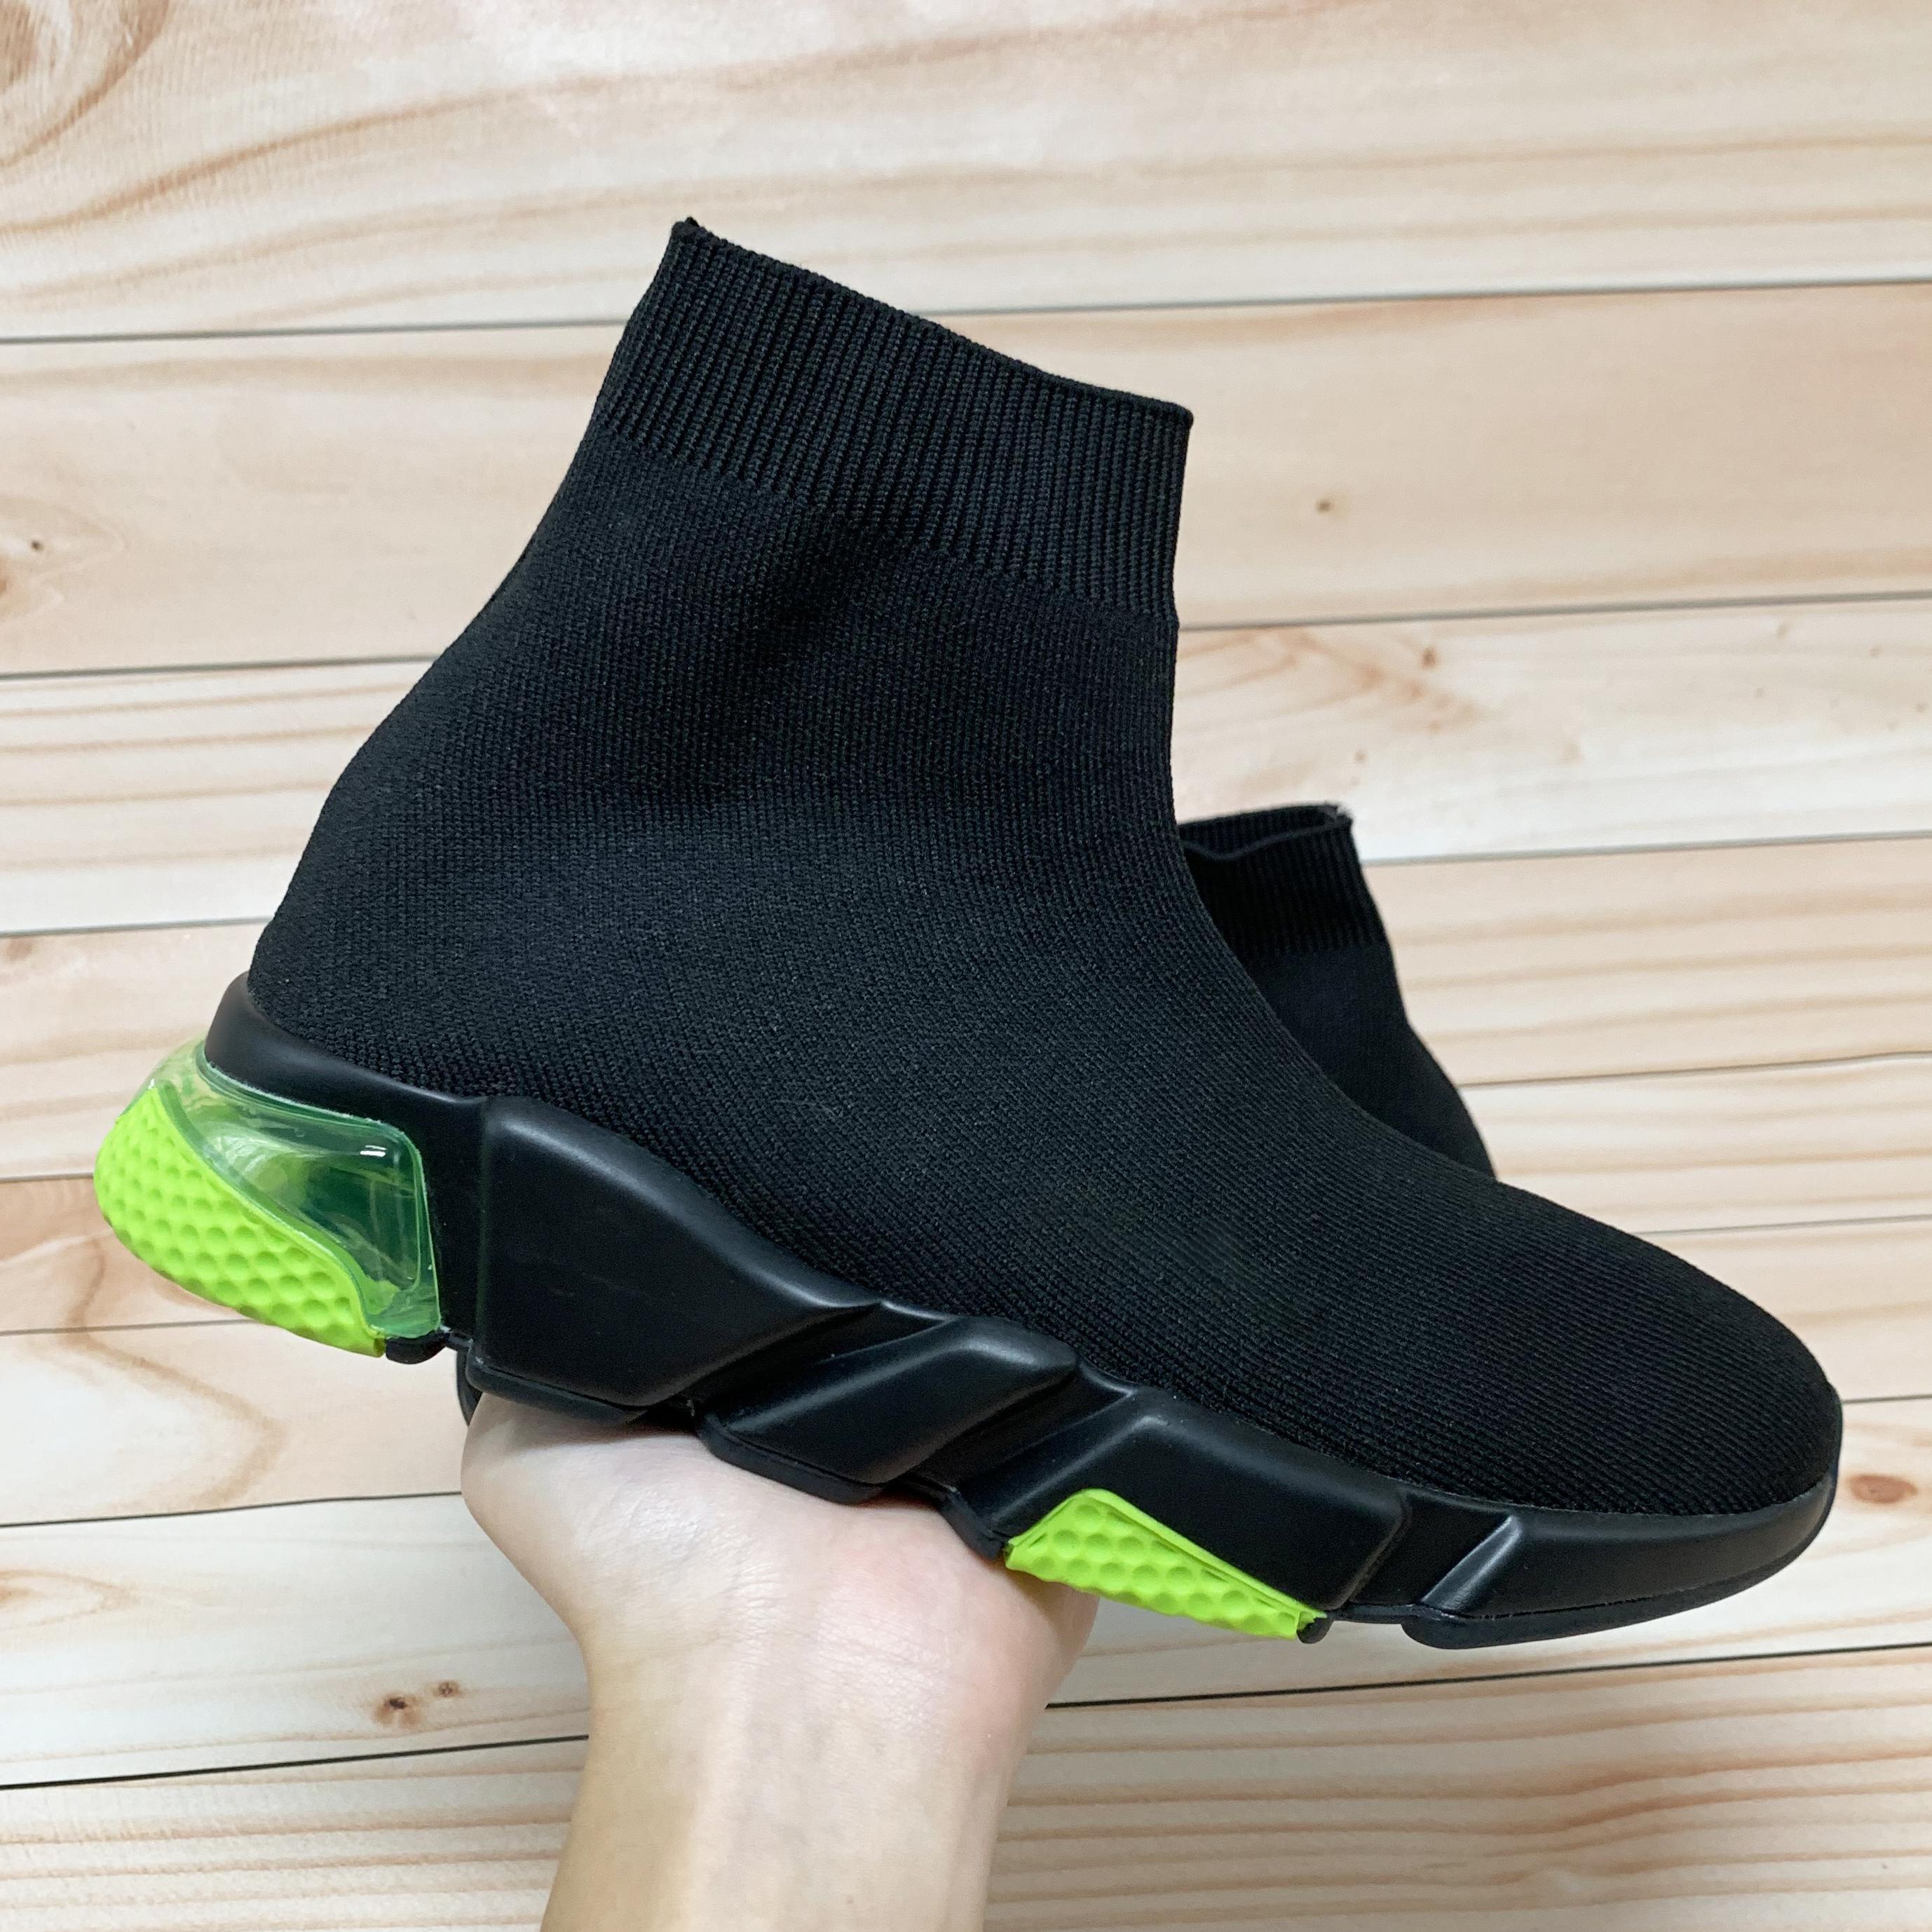 Novo Treinador de Velocidade de Paris Limpar Sneakers Sneakers Borgonha Oreo Triplo Preto Branco Branco Fluo Fluo Esticar Mulheres Mulheres Running Shoes US 5.5-11